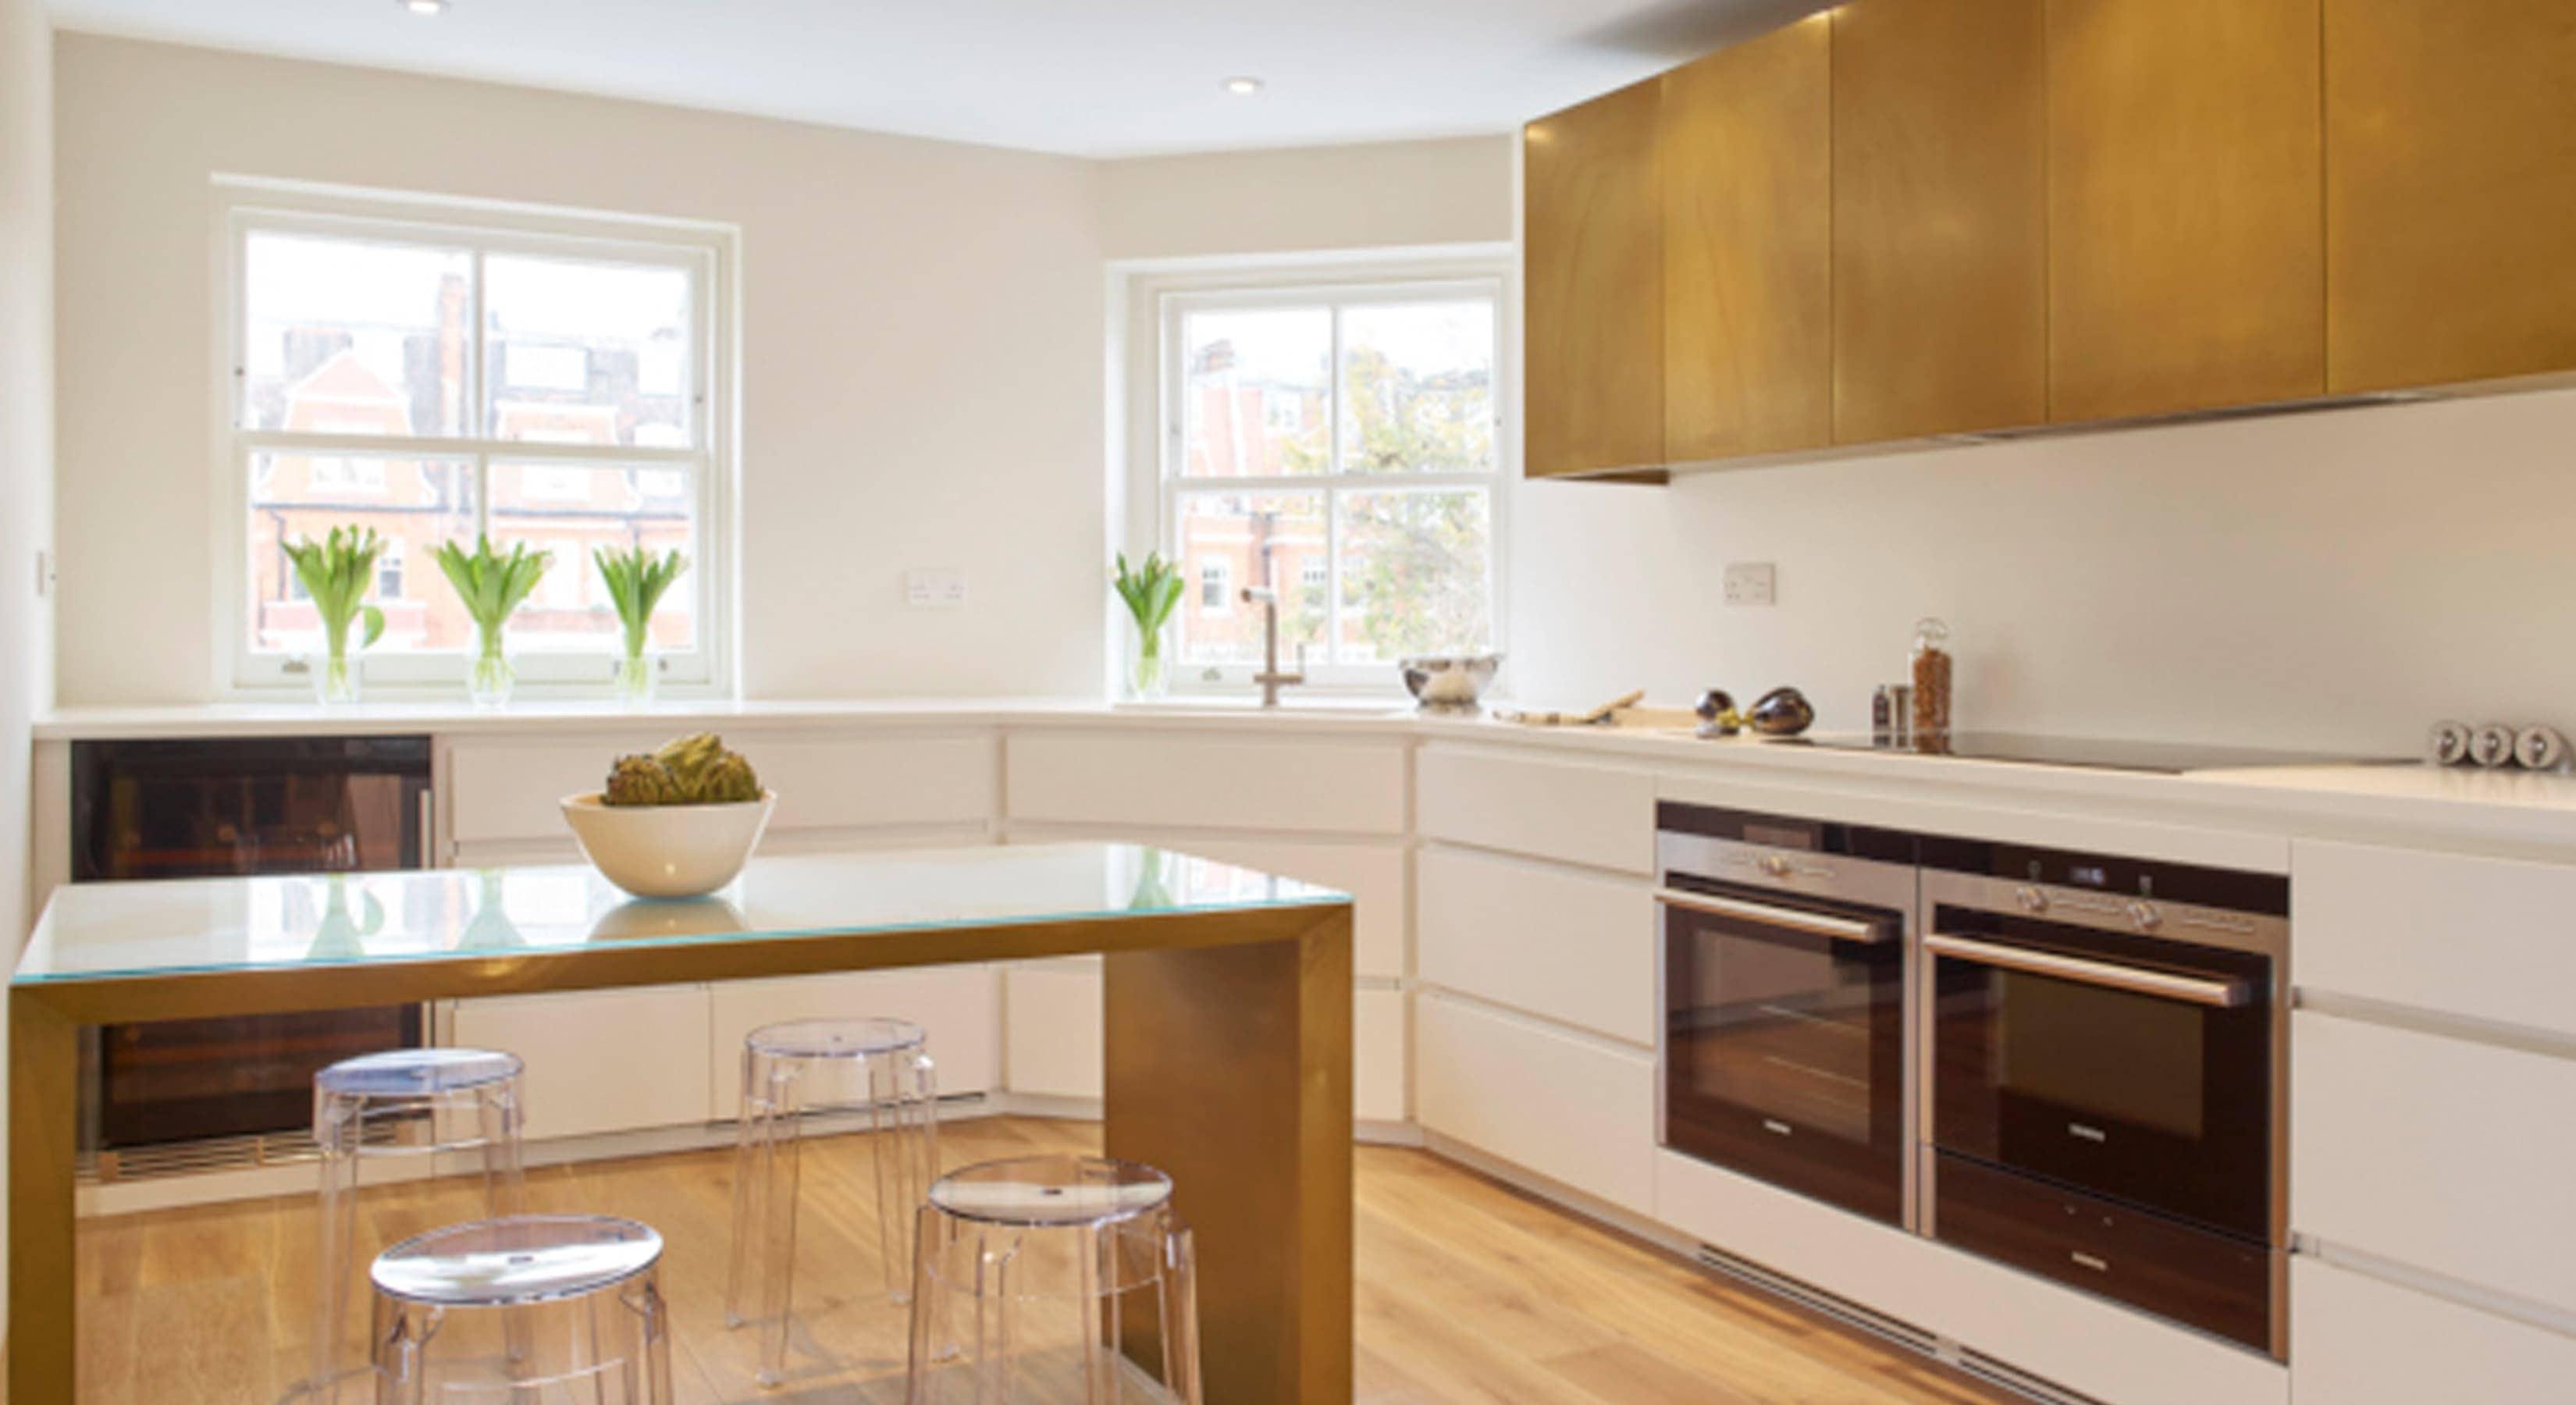 Horley kitchen extension concept